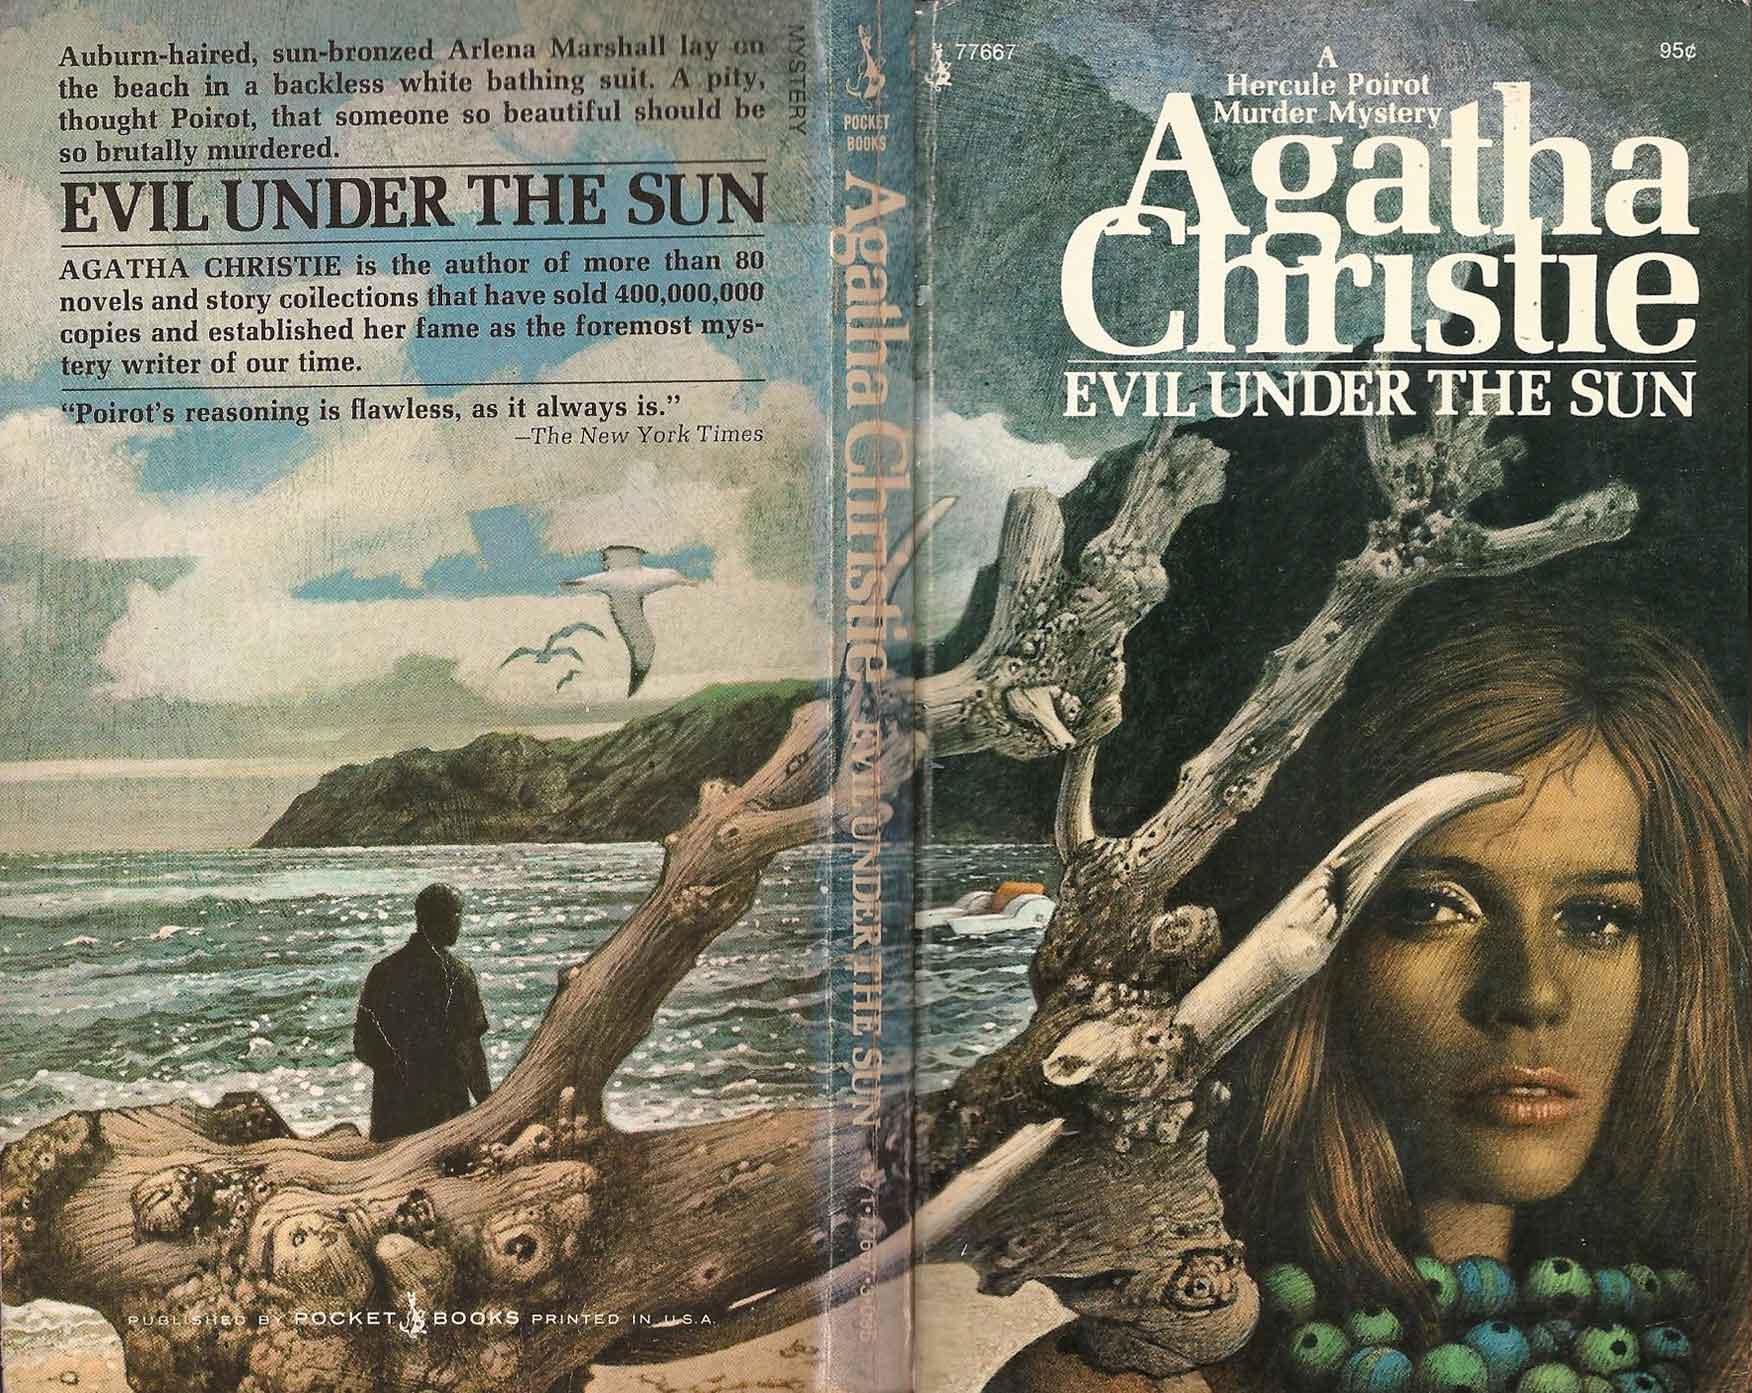 Agatha Christie Tom Adams Evil Under the Sun Pocket Books sm